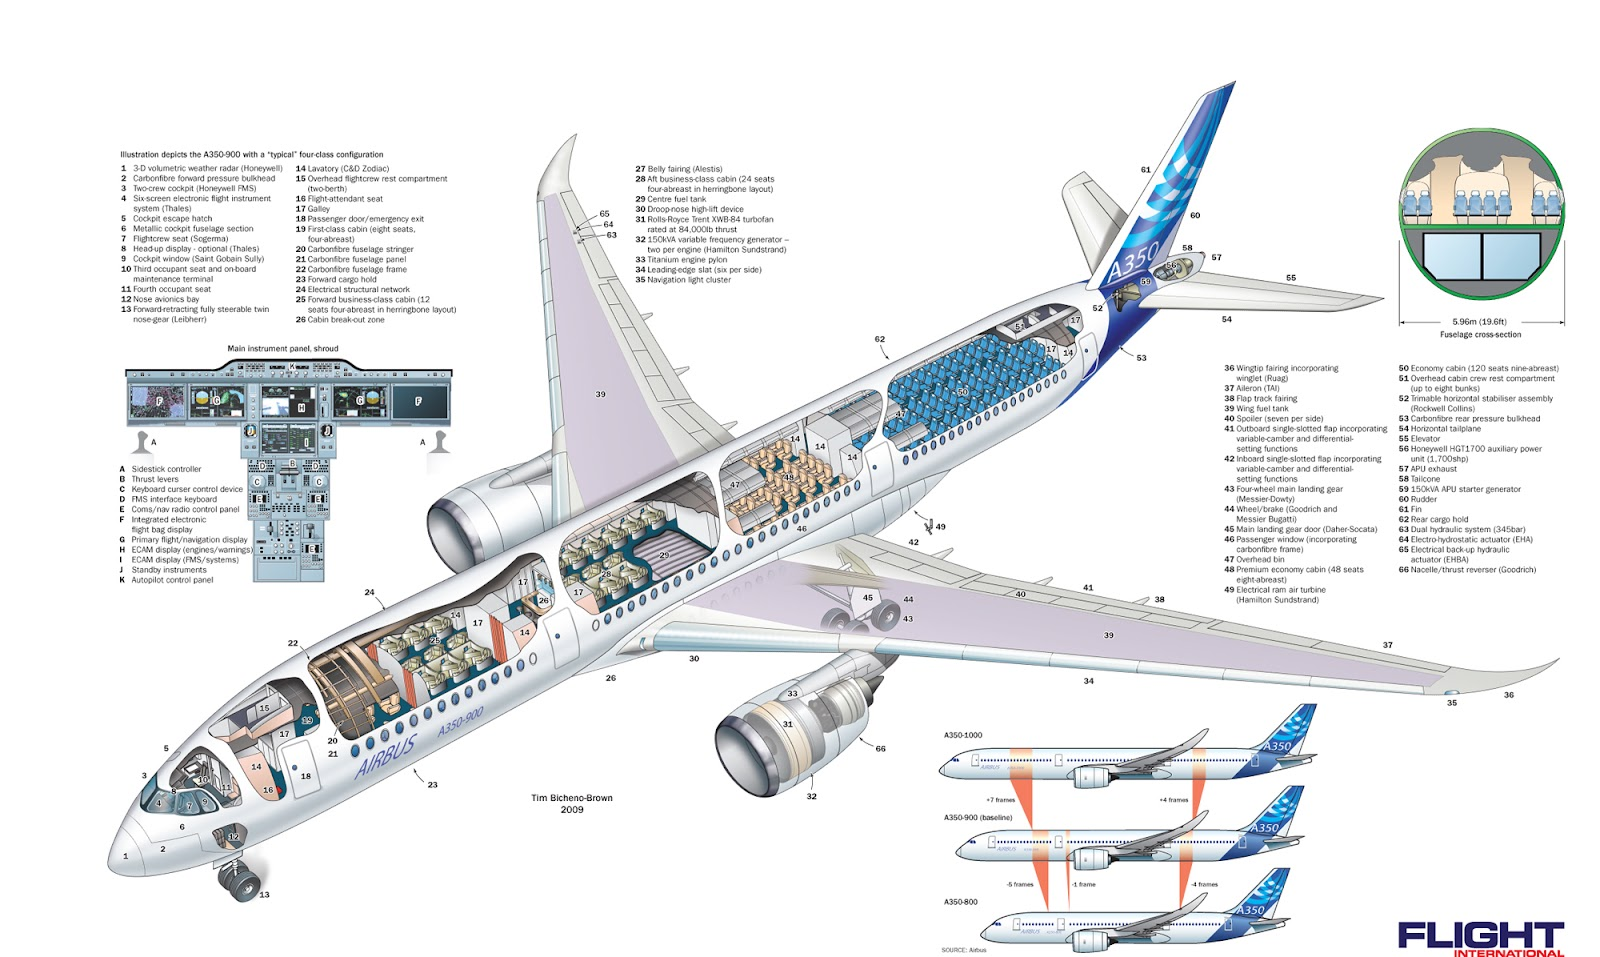 Beaver Skeleton Diagram Emg Pickup Wiring Airbus A350-900 Cutaway View ~ World Stewardess Crews